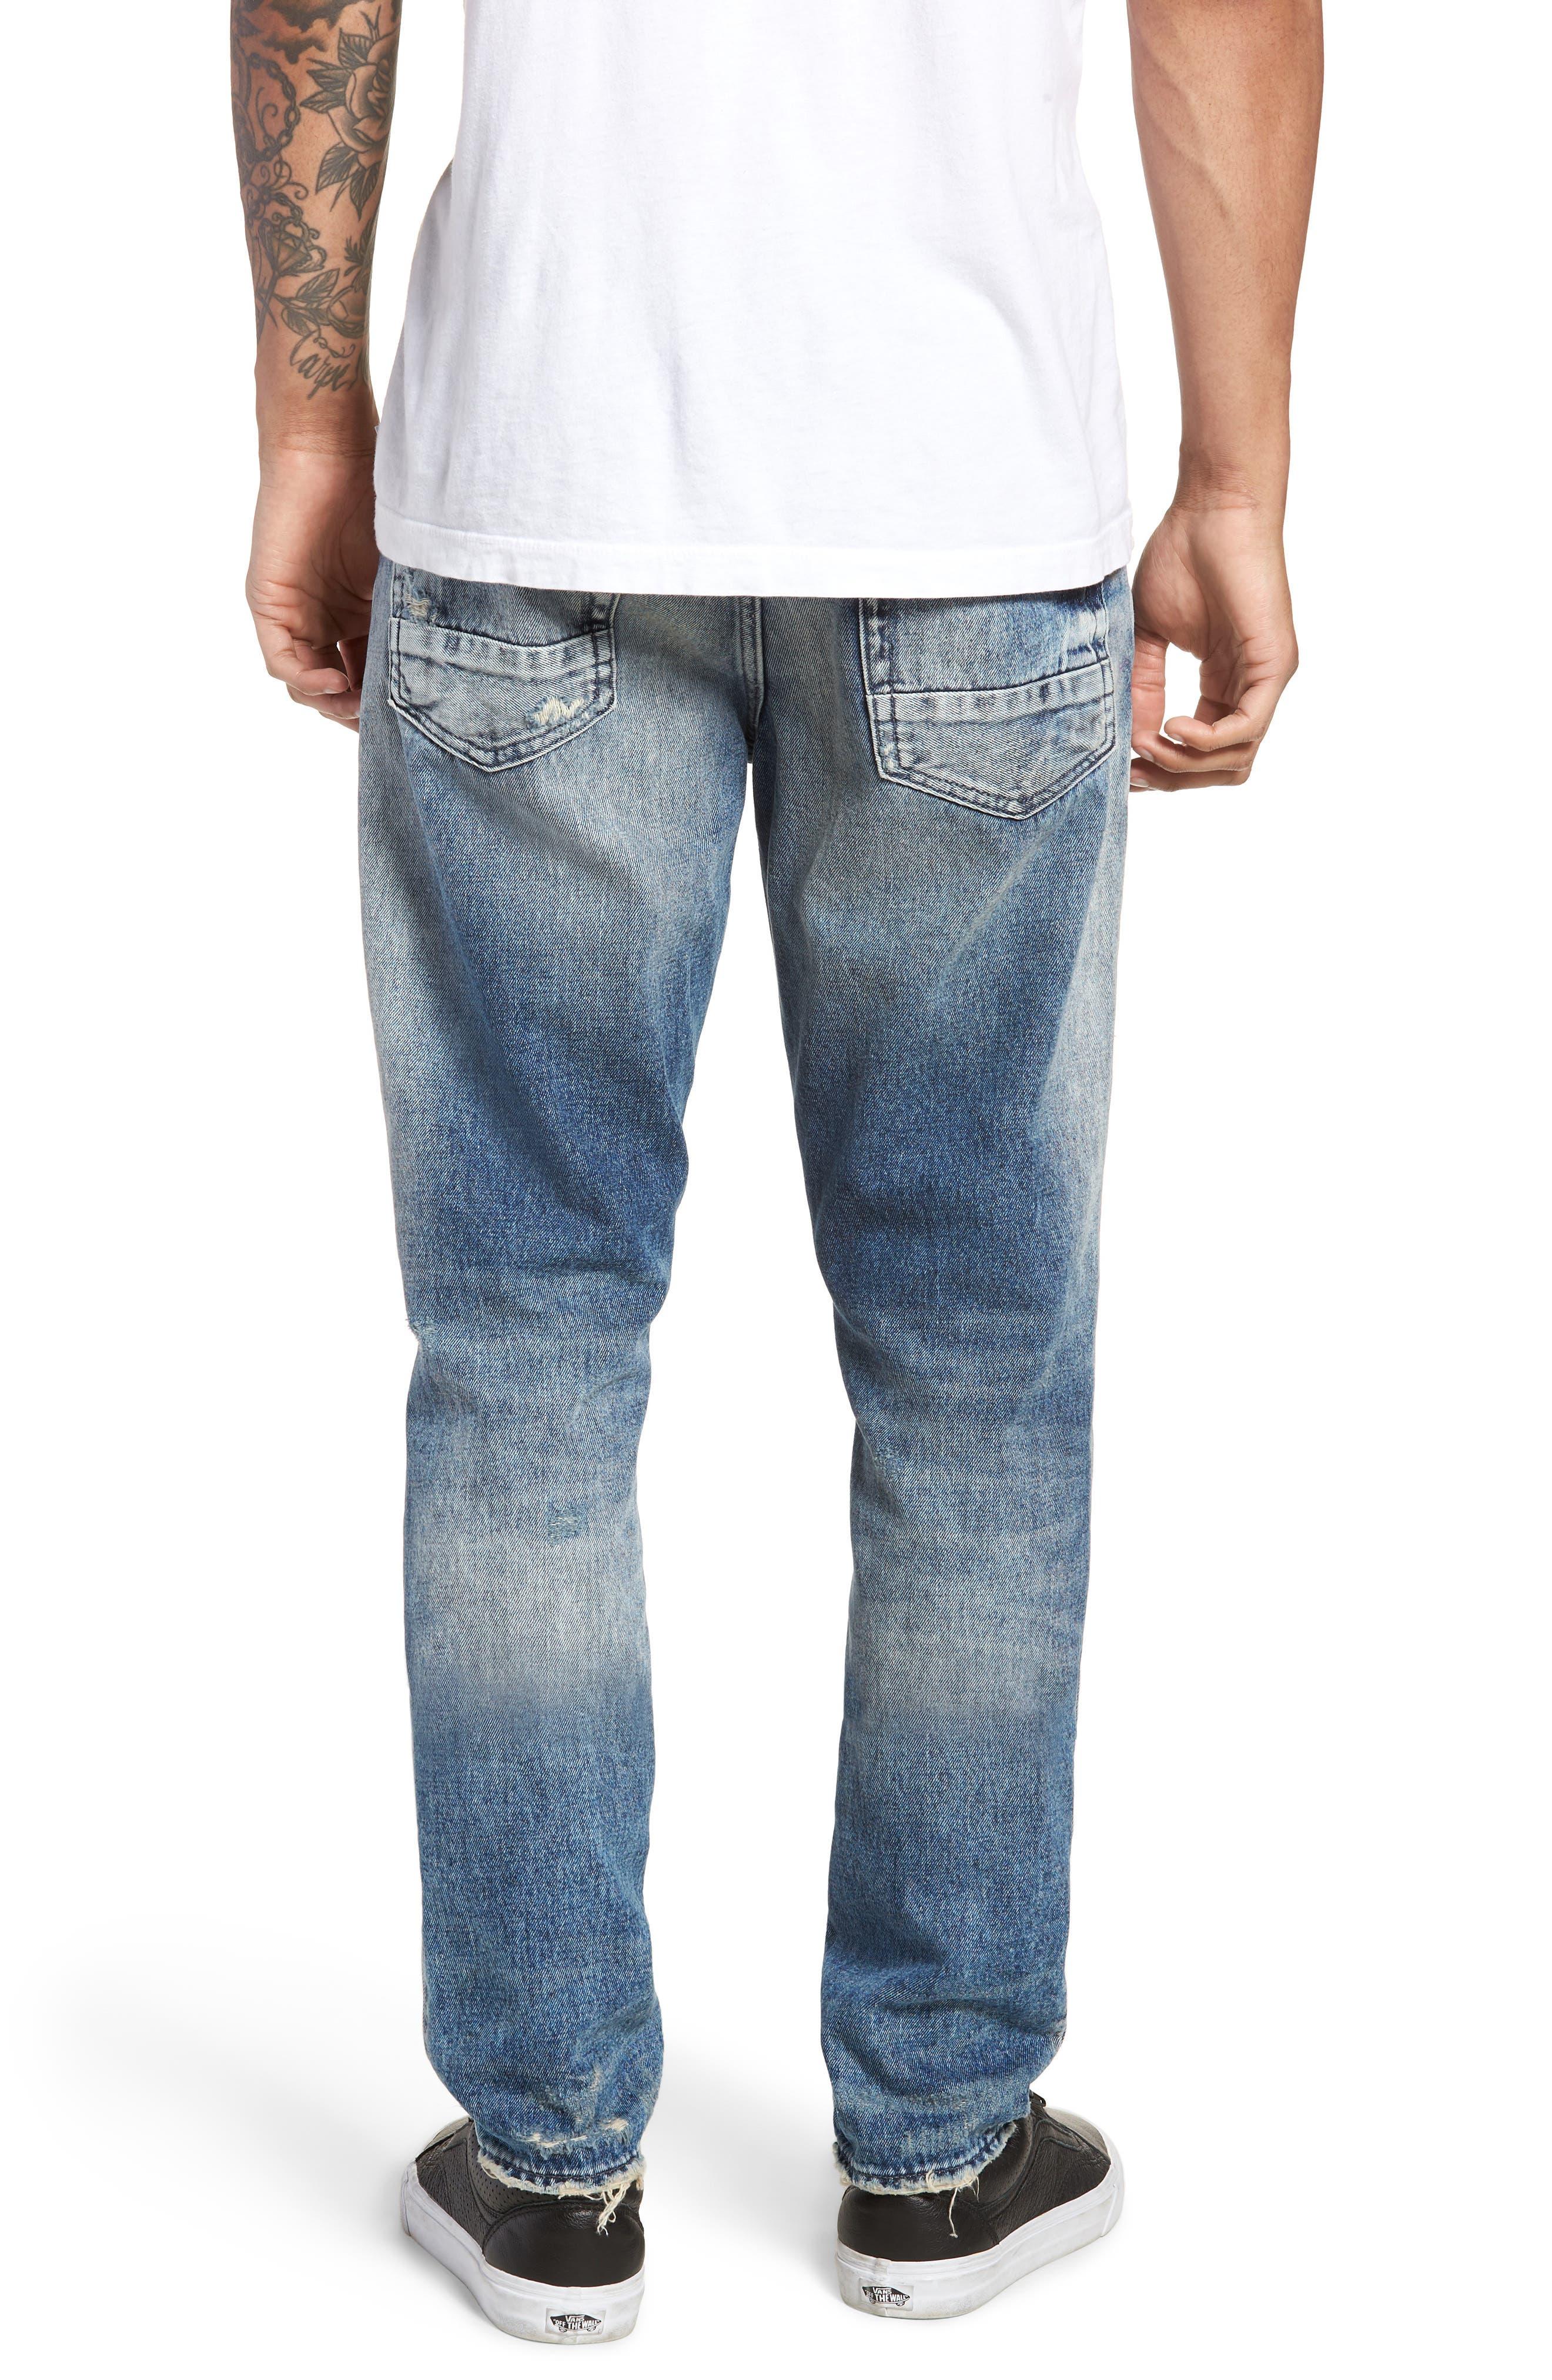 Demon Slim Straight Leg Jeans,                             Alternate thumbnail 2, color,                             MEXICO